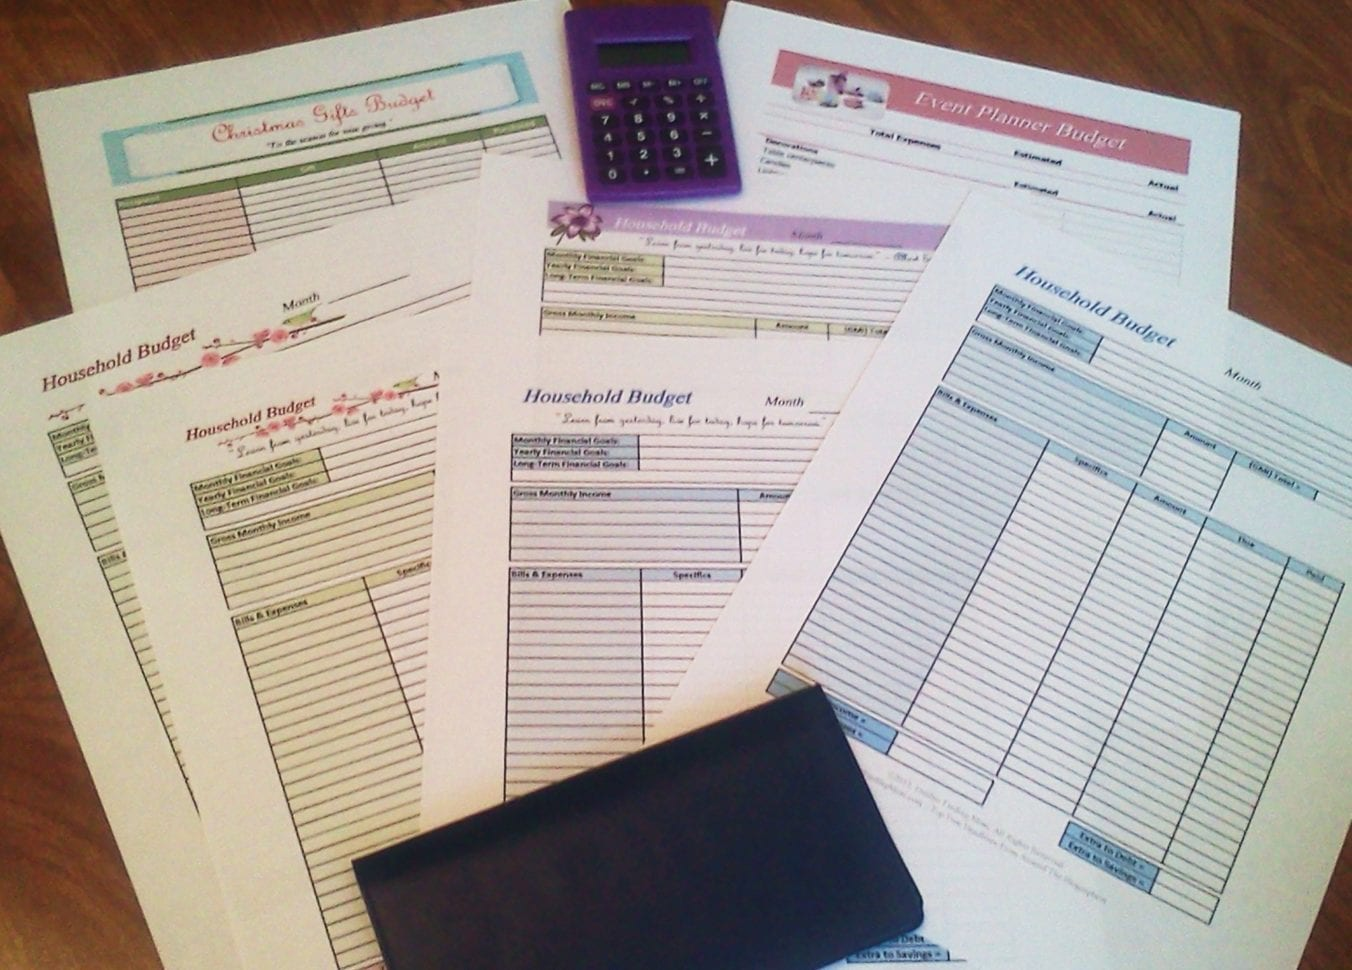 Financial Planner Sheet Financial Planning Excel Sheet Spreadsheet Templates For Busines